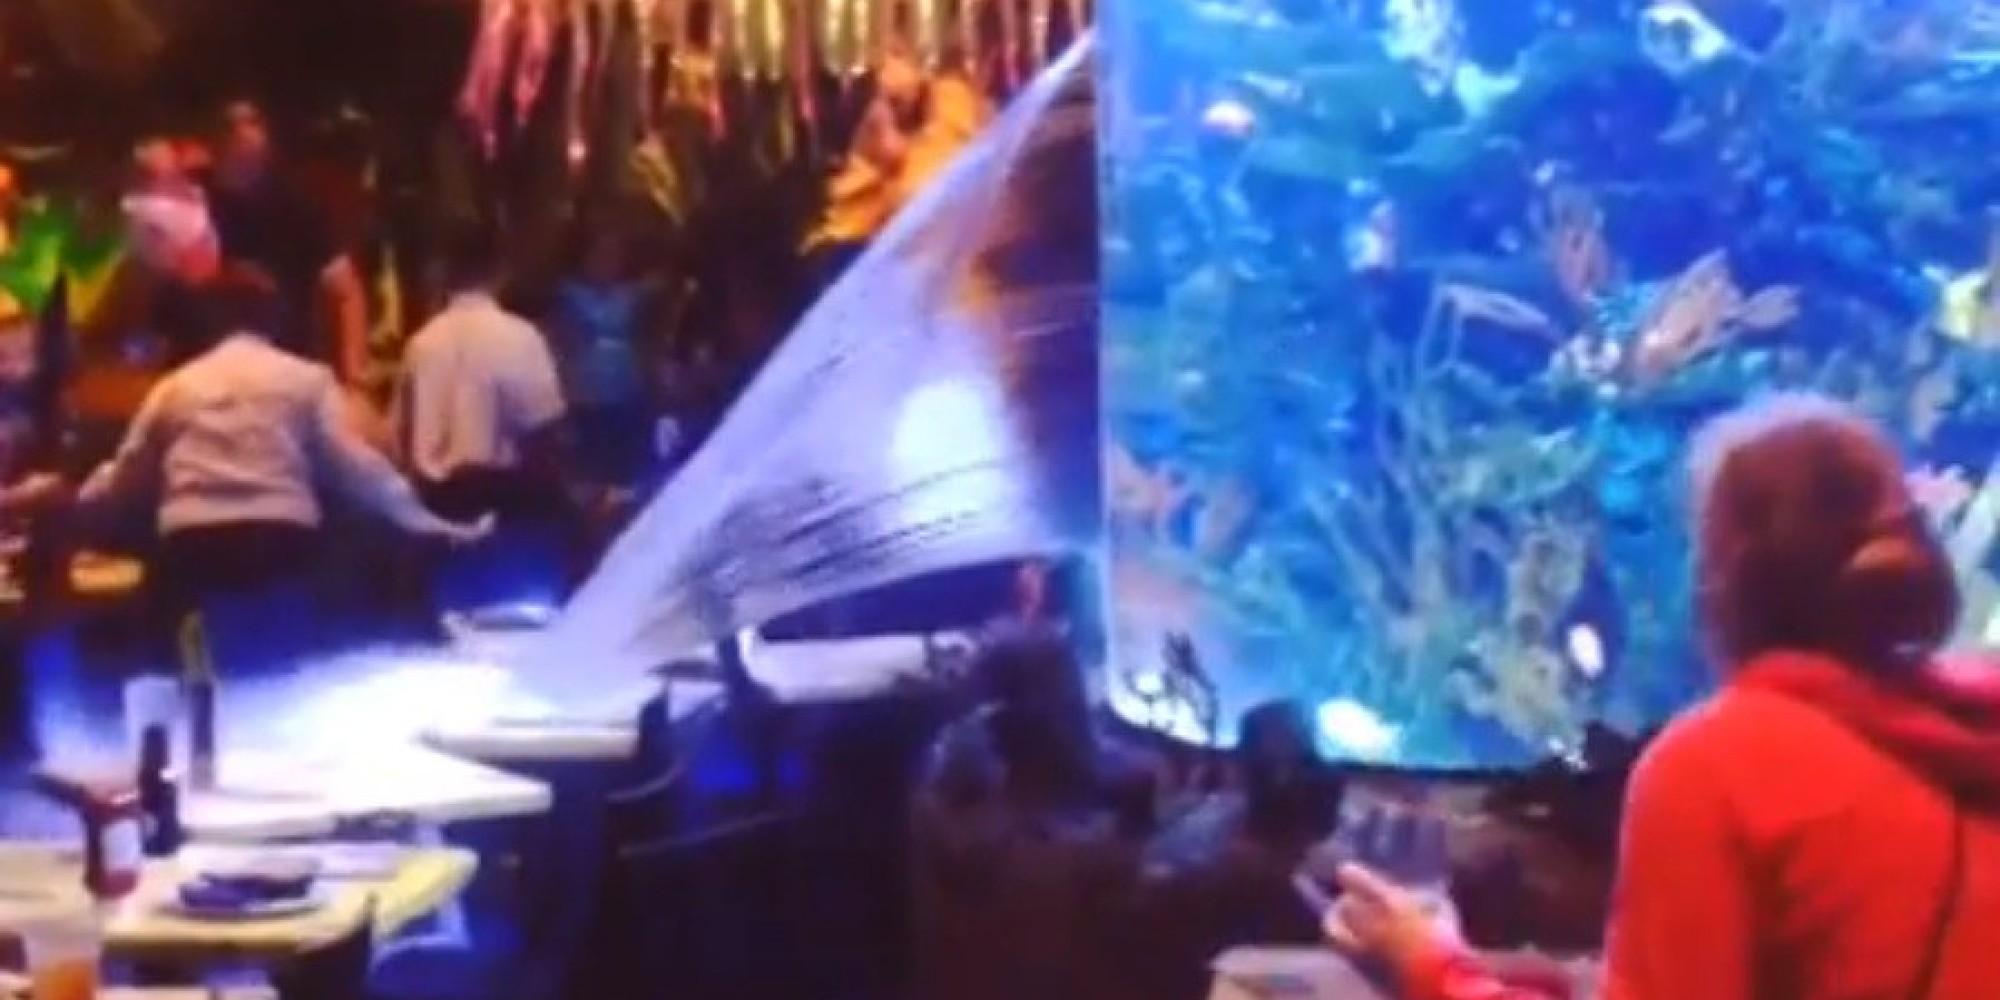 Young disneyworld esplode acquario la gente salva i for How to fix a leaking fish tank